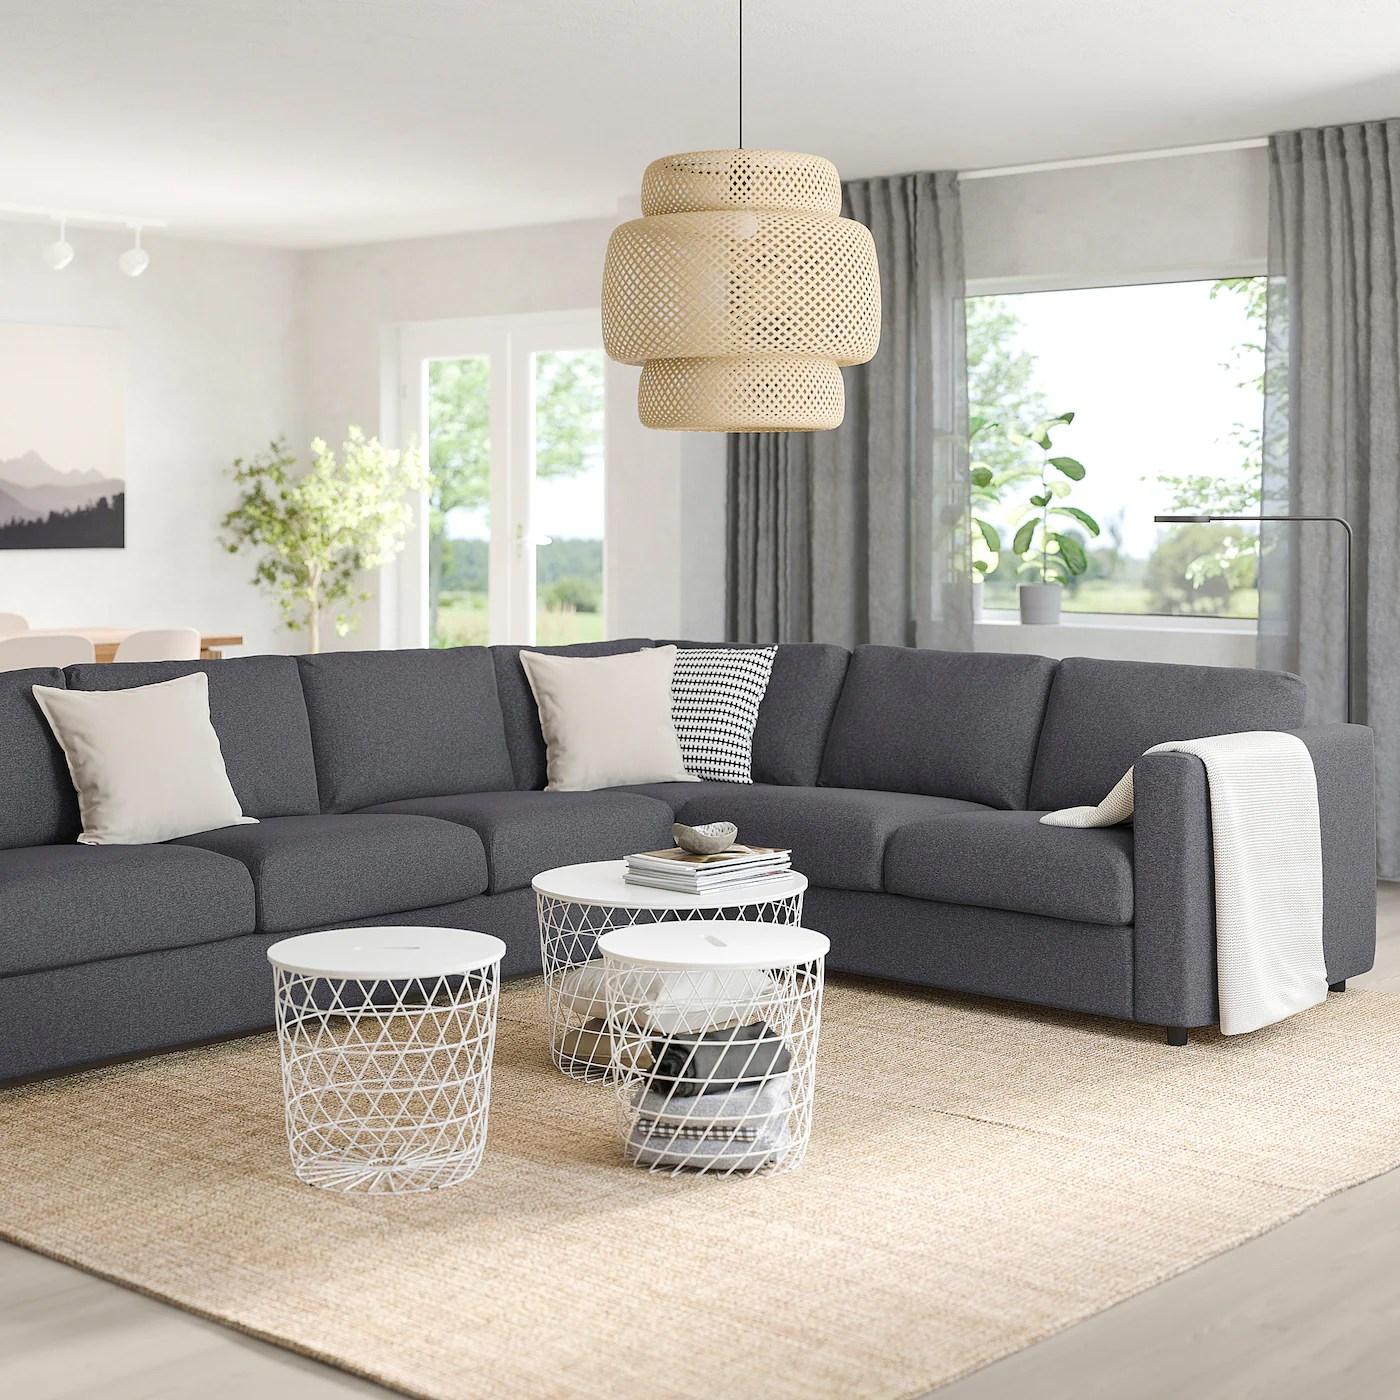 Slipcovers for ikea's färlöv armchair start at $149. VIMLE Corner sofa, 5-seat, Gunnared medium grey - IKEA Ireland